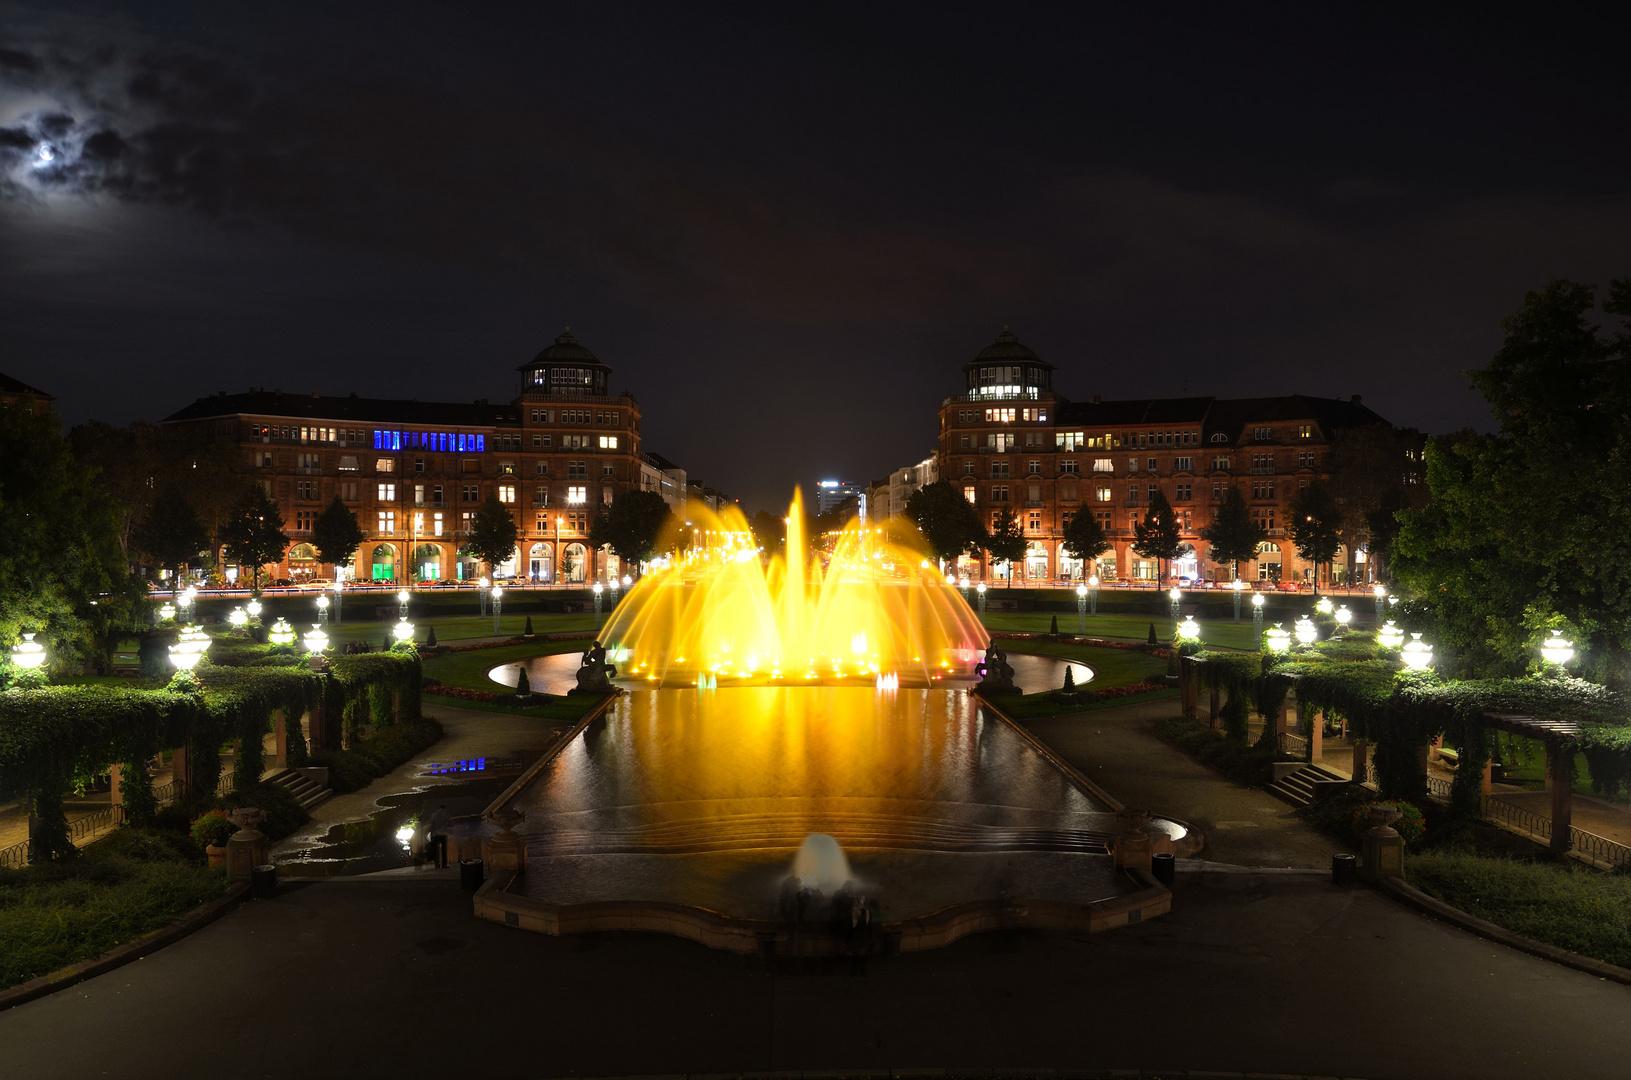 Mannheim@night 1